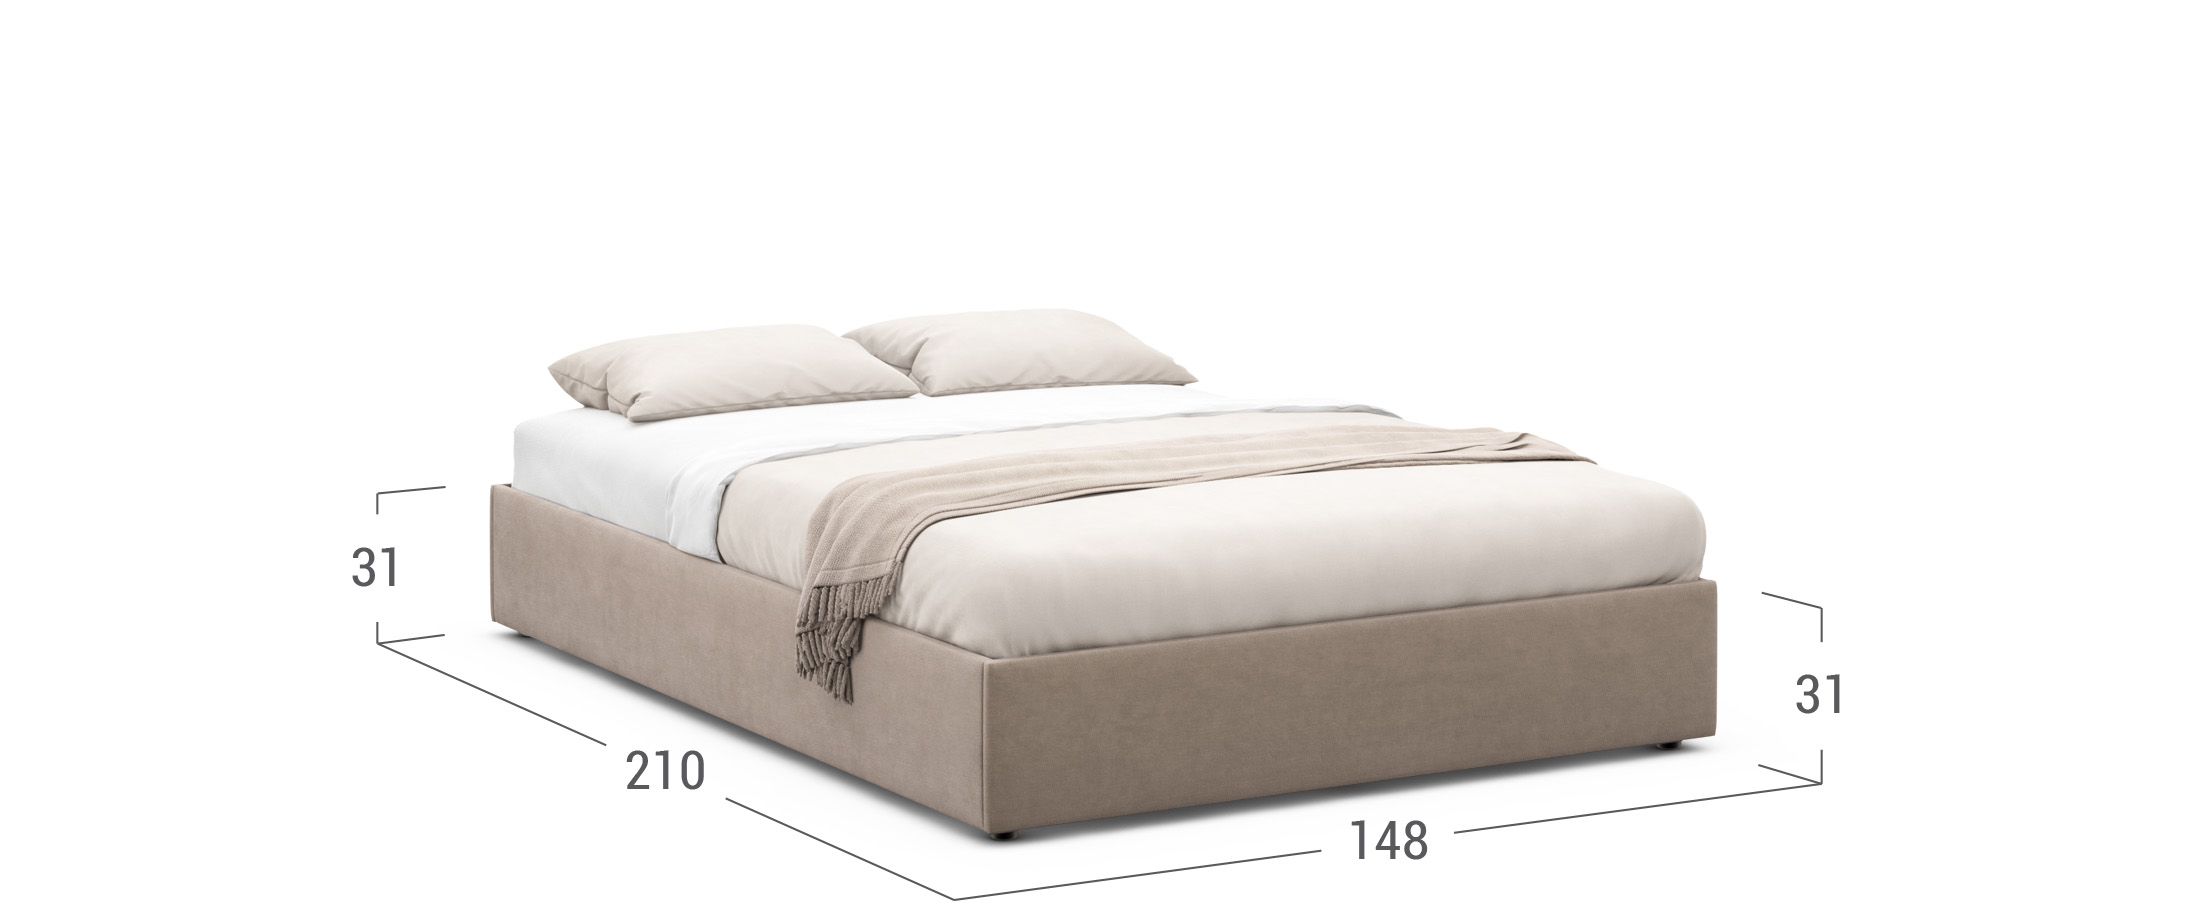 Кровать двуспальная 140х200 MOON FAMILY 1240